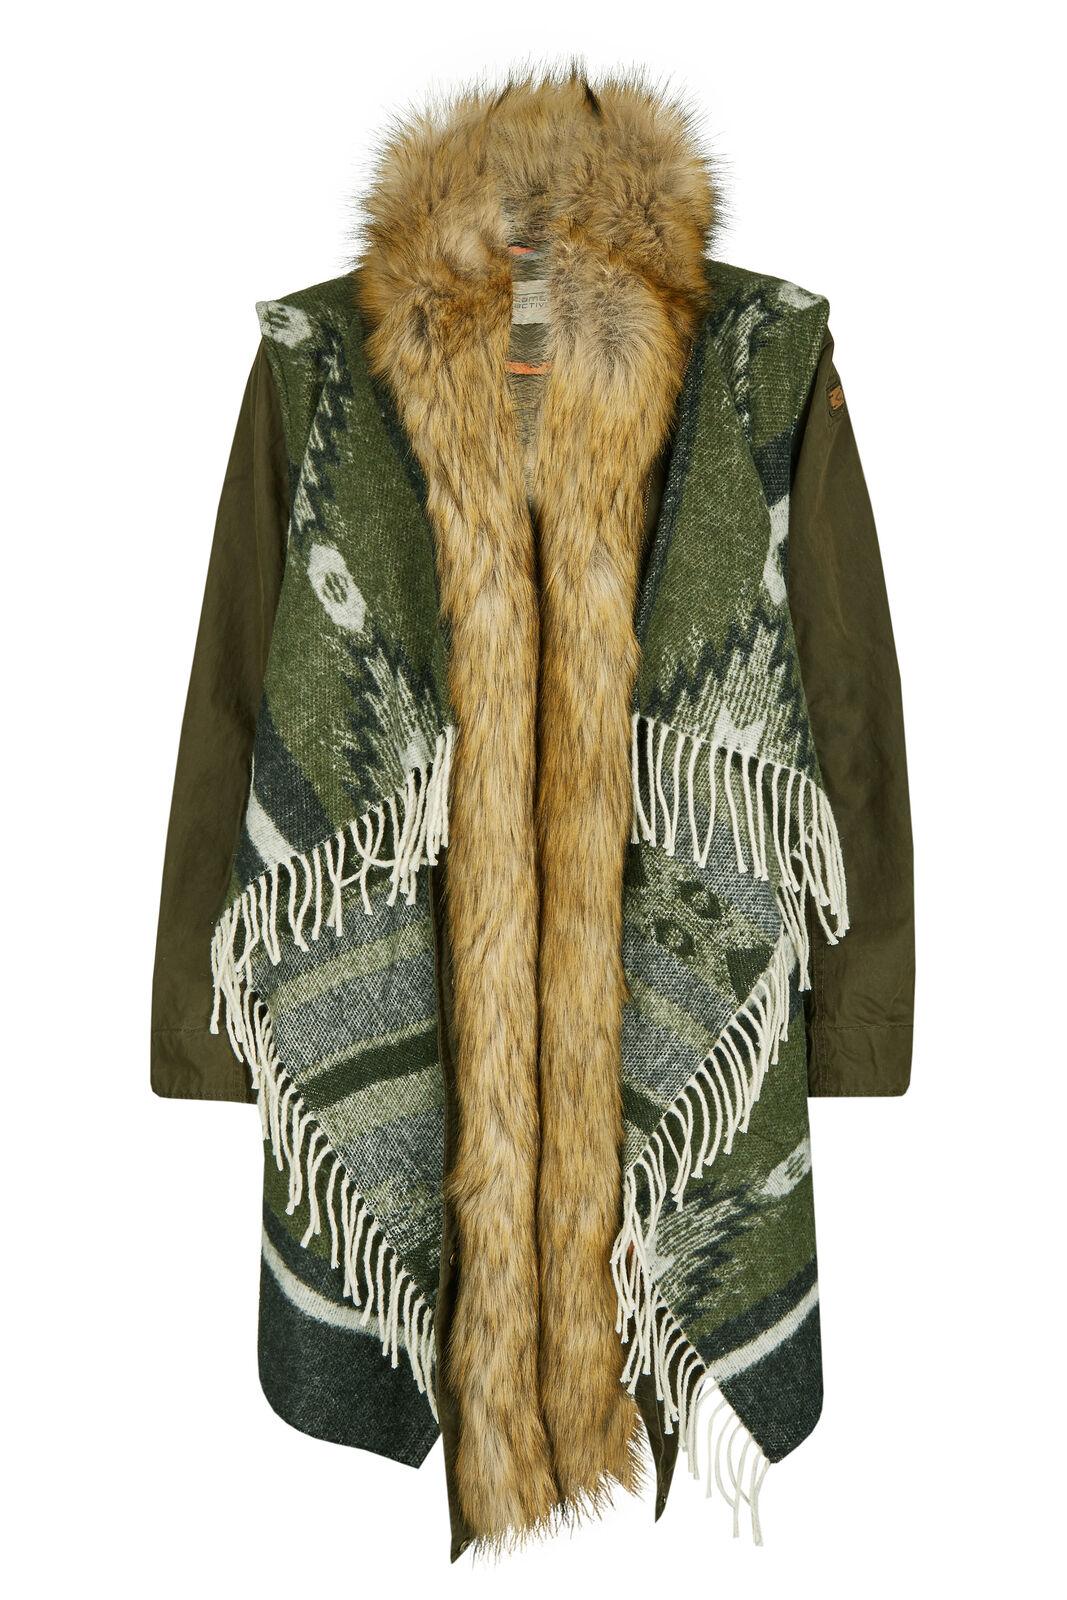 Camel active Damen 2in1 Jacke Plaid Parka Winterjacke grün 310831 8-62 35 NEU